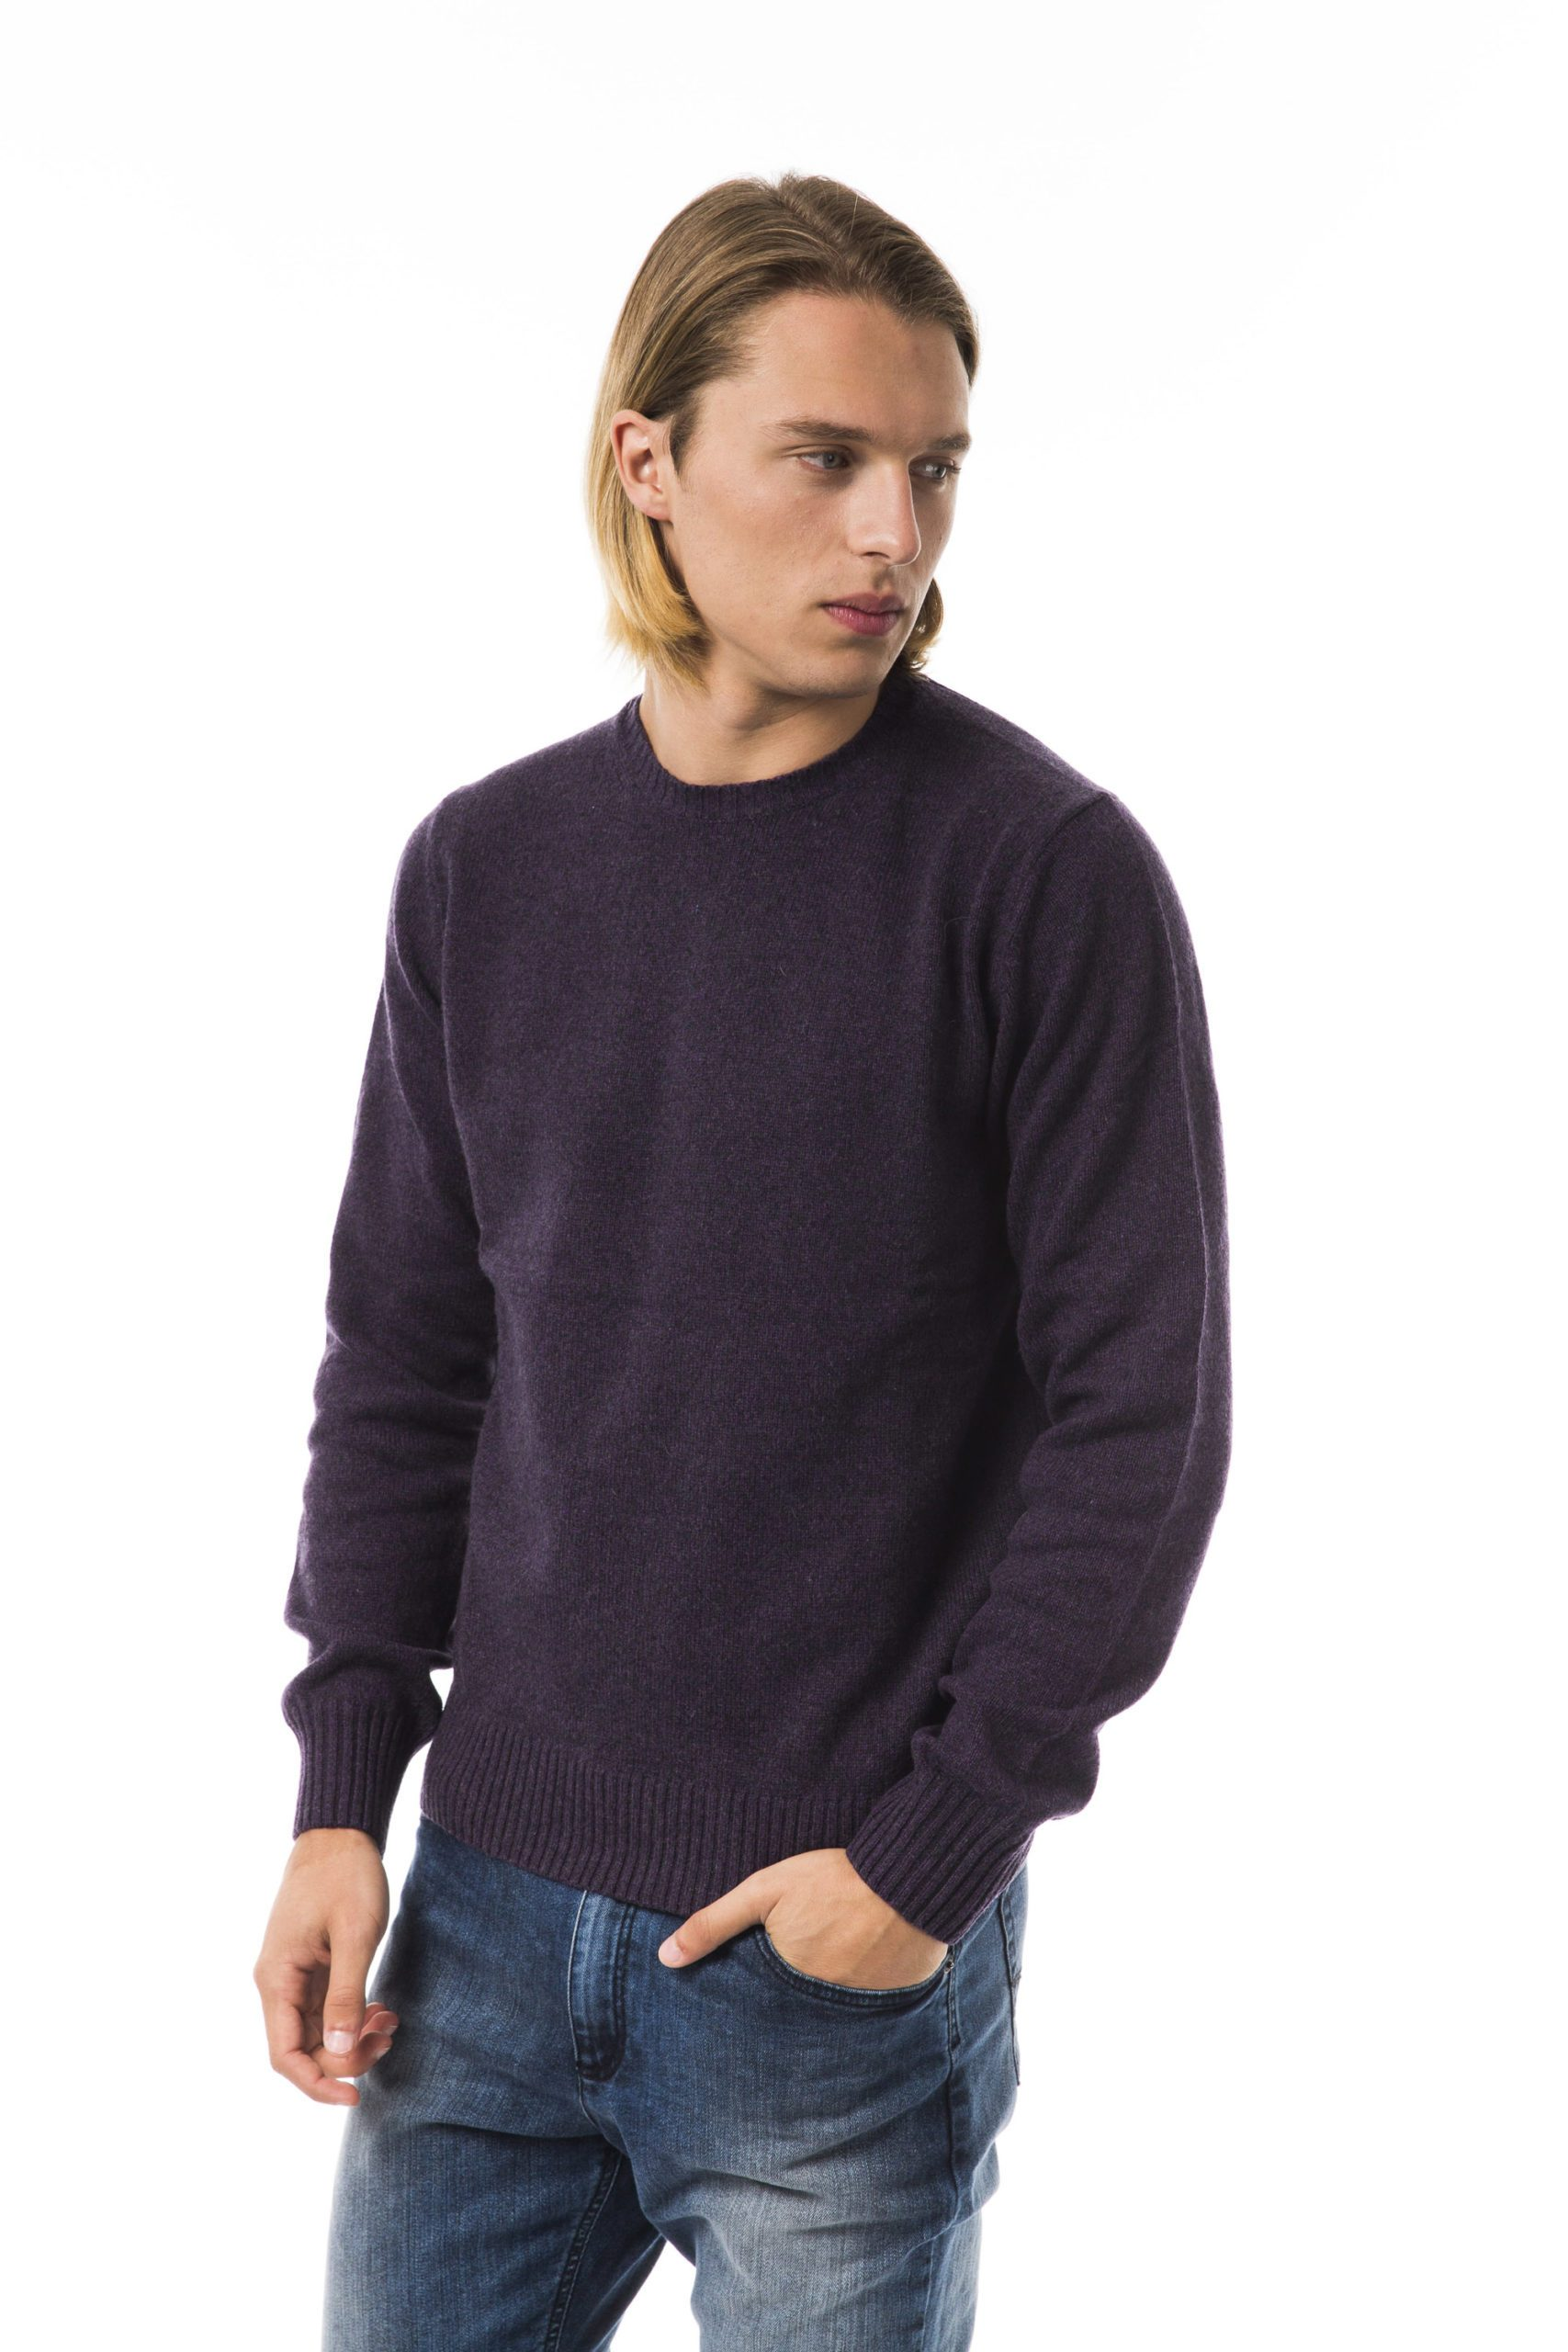 Uominitaliani Men's Sweater Violaantr Sweater Violet UO815731 - L